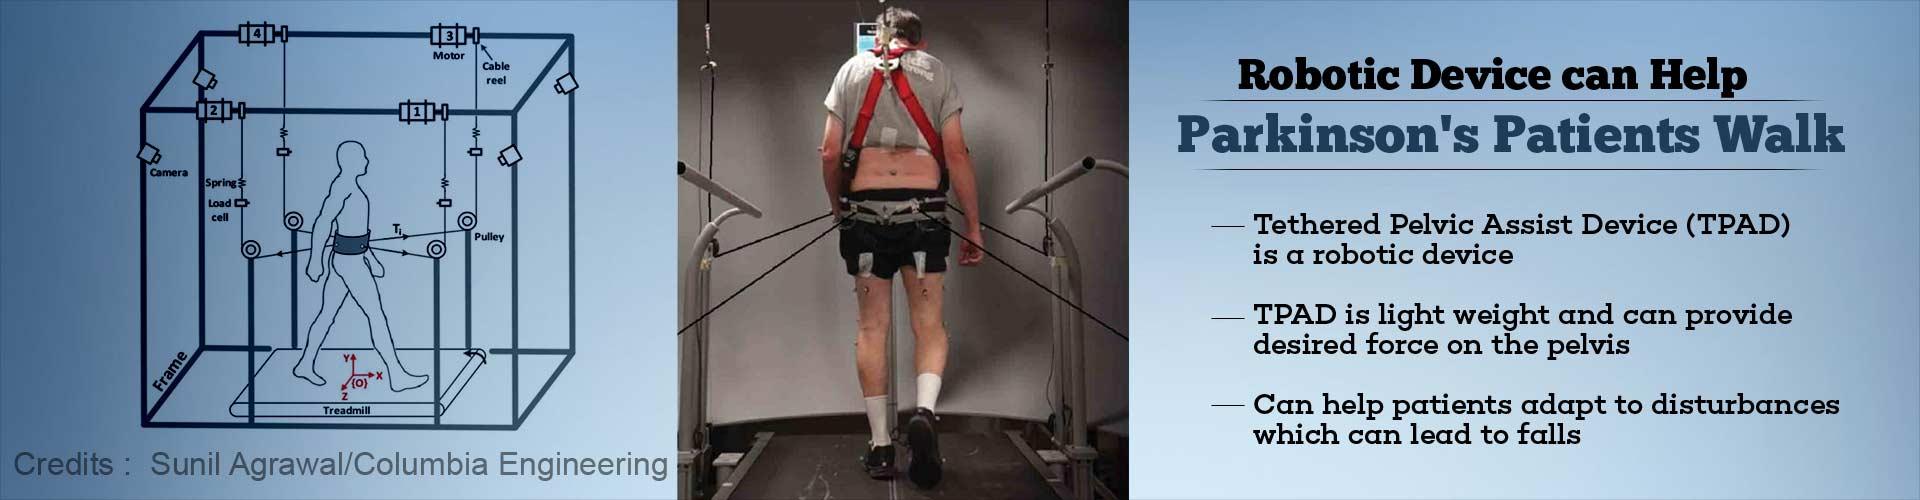 Pelvic Assist Robotic Device can help Parkinsons Patient Walk